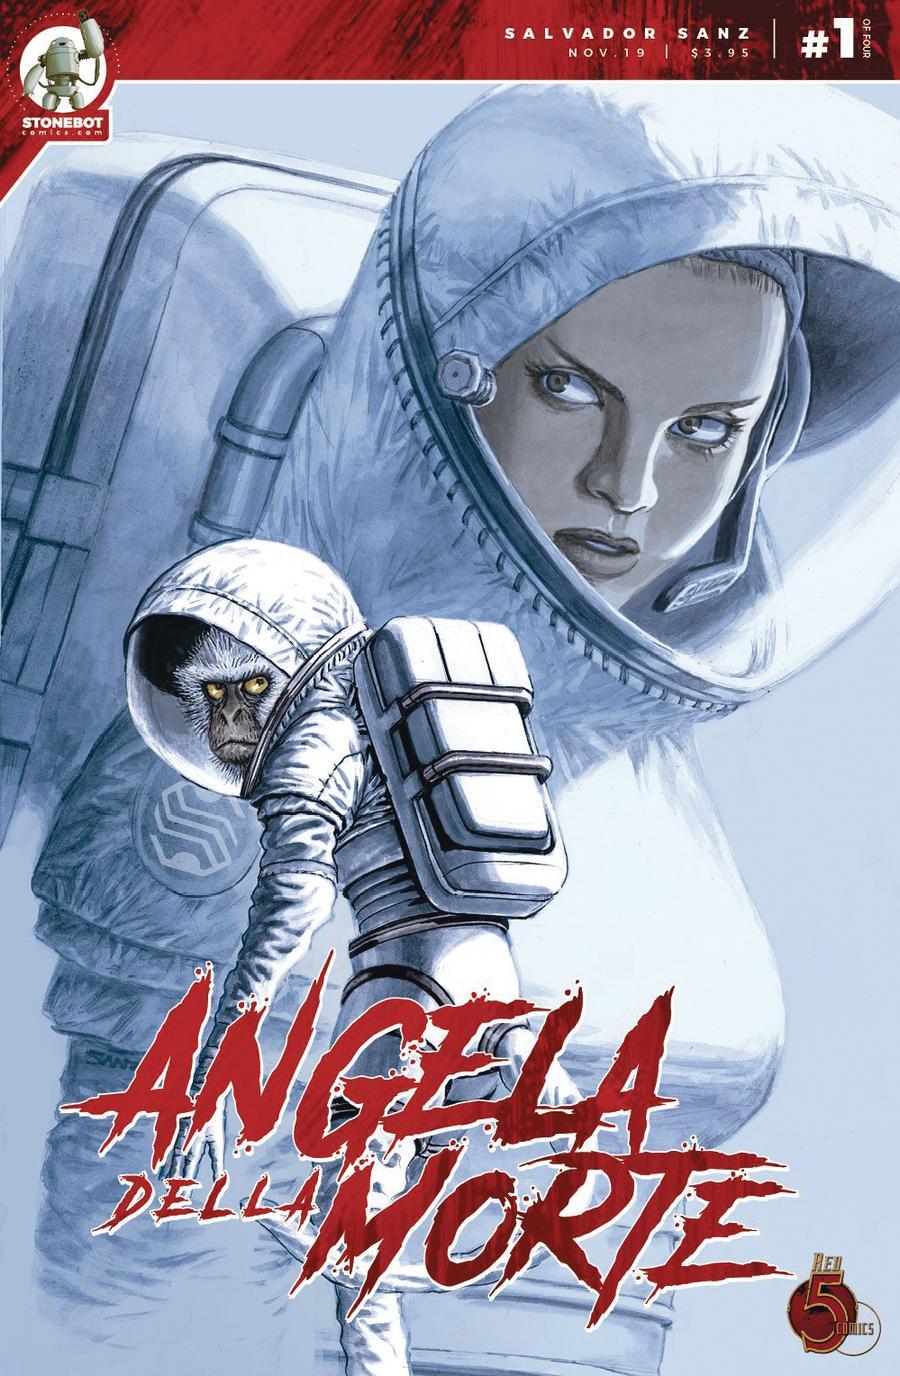 Angela Della Morte #1 Cover A Regular Salvador Sanz Cover